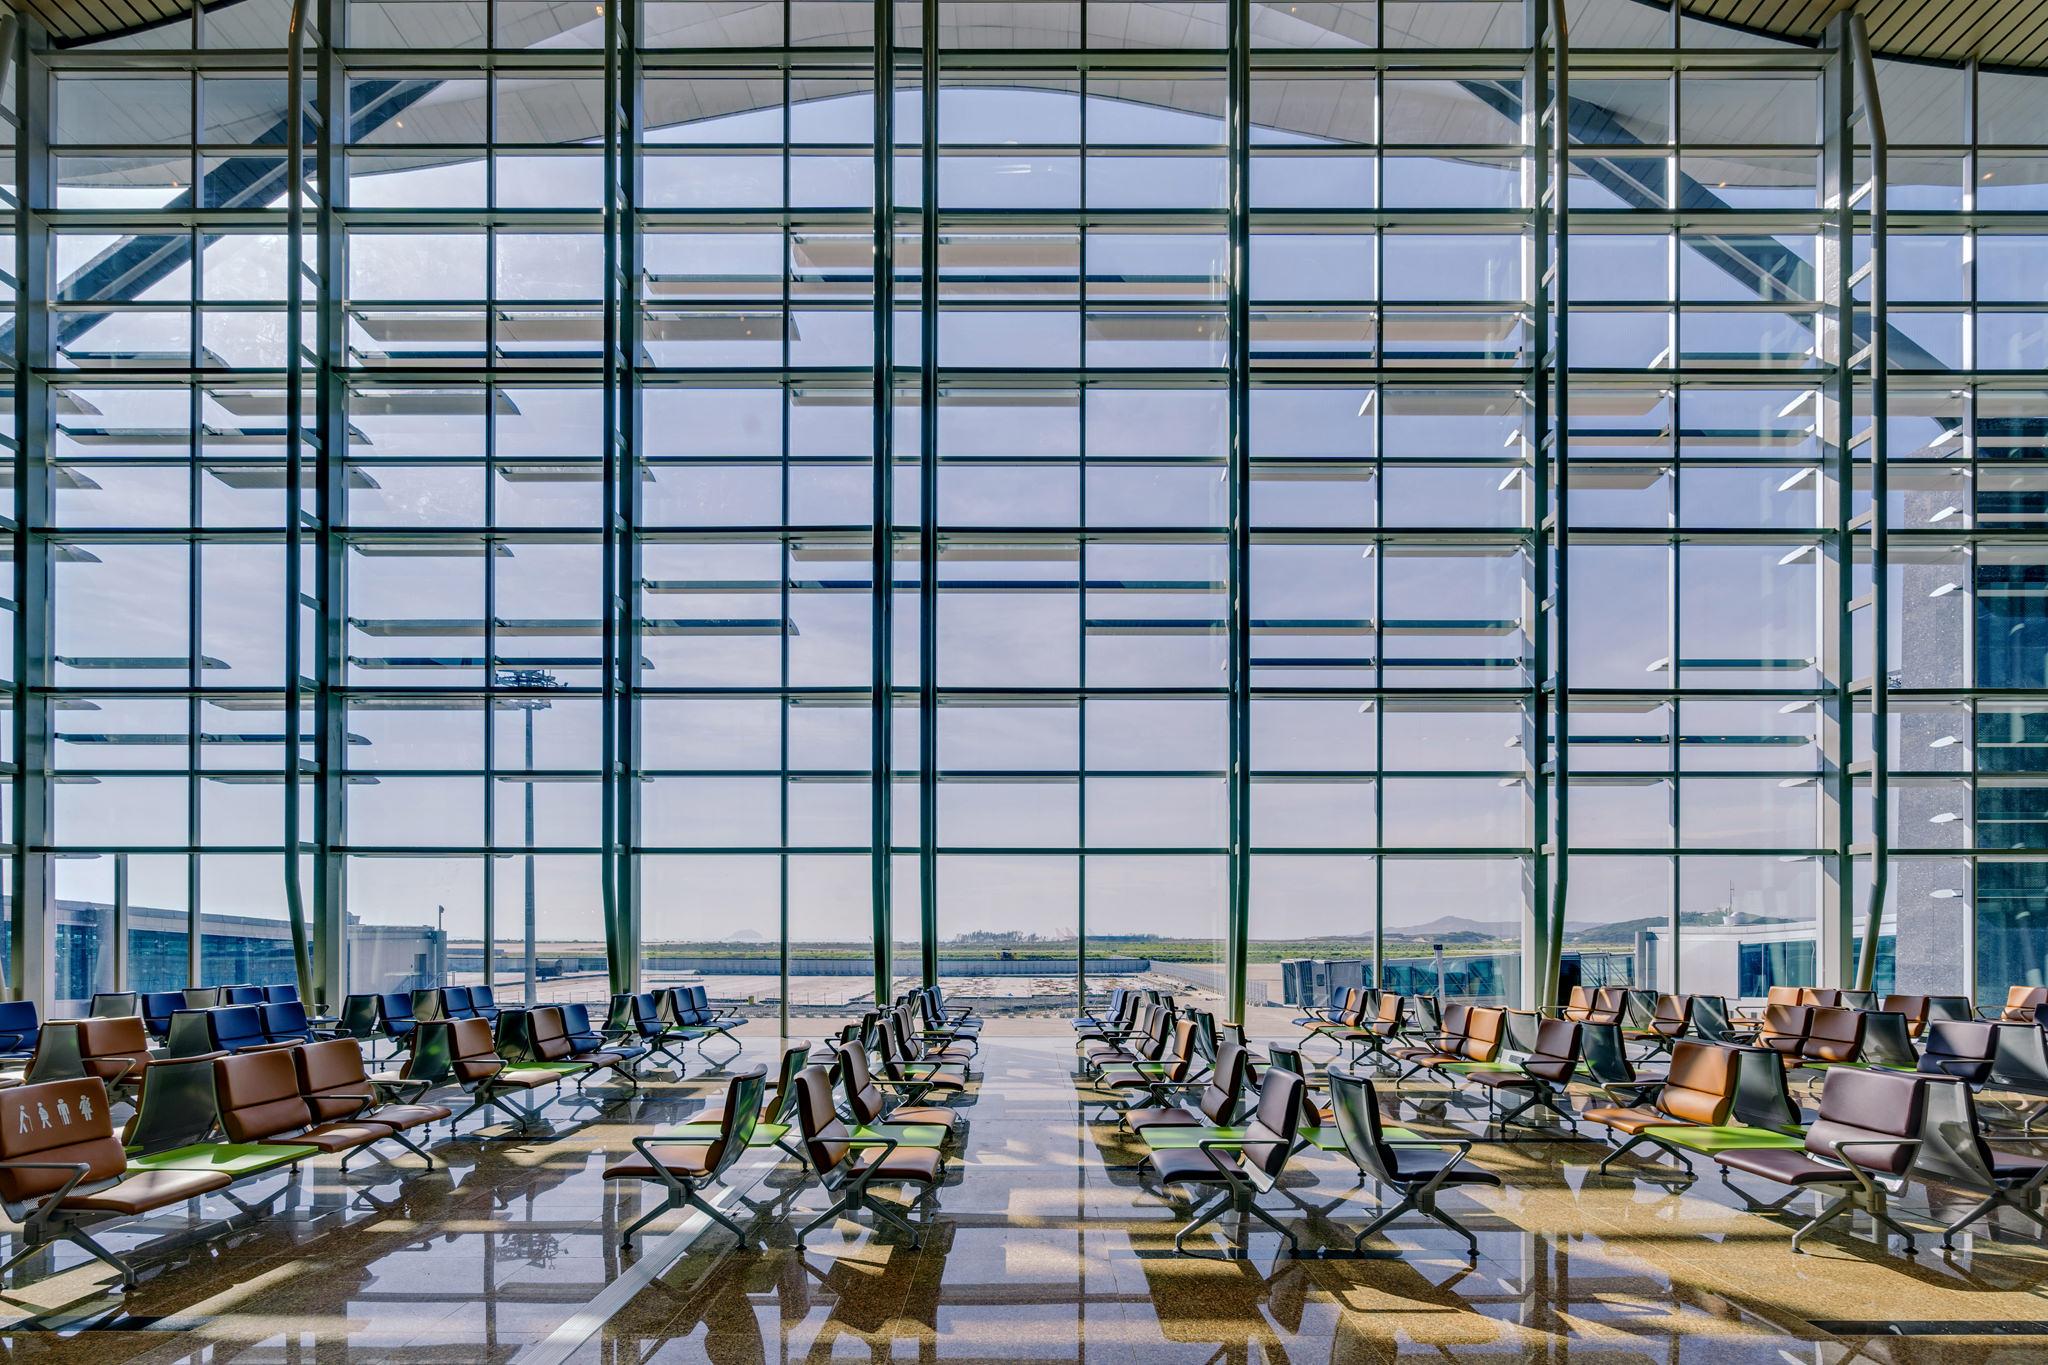 20180626 - Cam Ranh Airport - Architecture - 0187.jpg